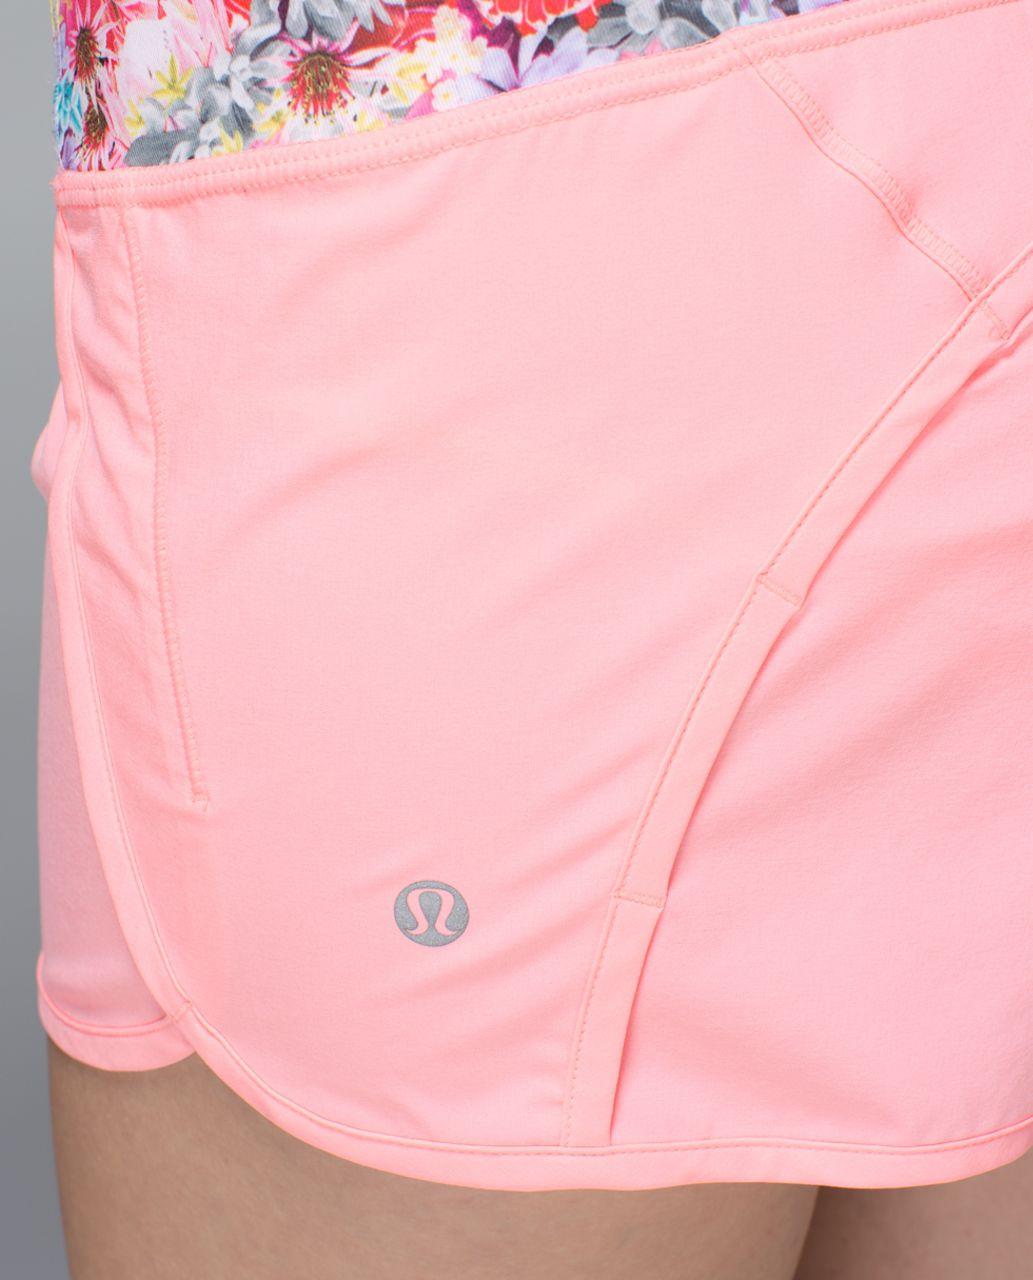 Lululemon Run Times Short *4-way stretch - Bleached Coral / Neon Pink / Flowabunga Mini Multi